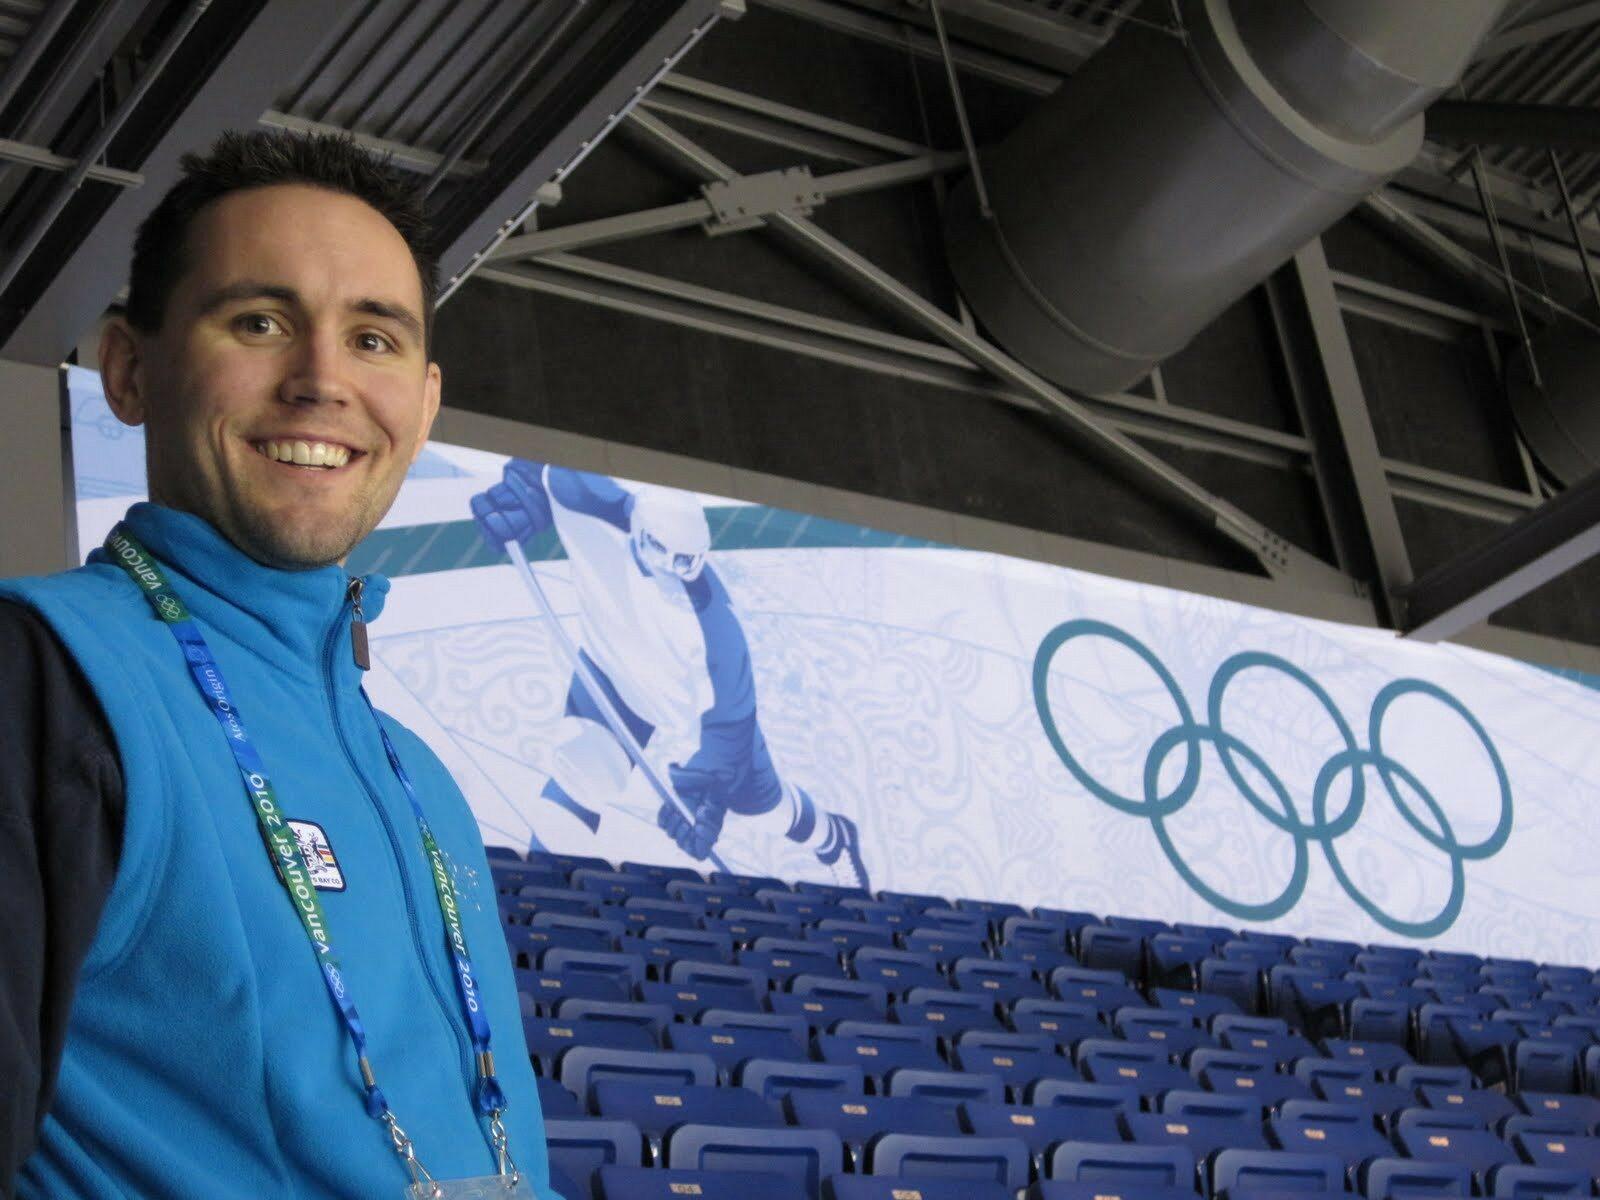 Tim - 2010 Olympics